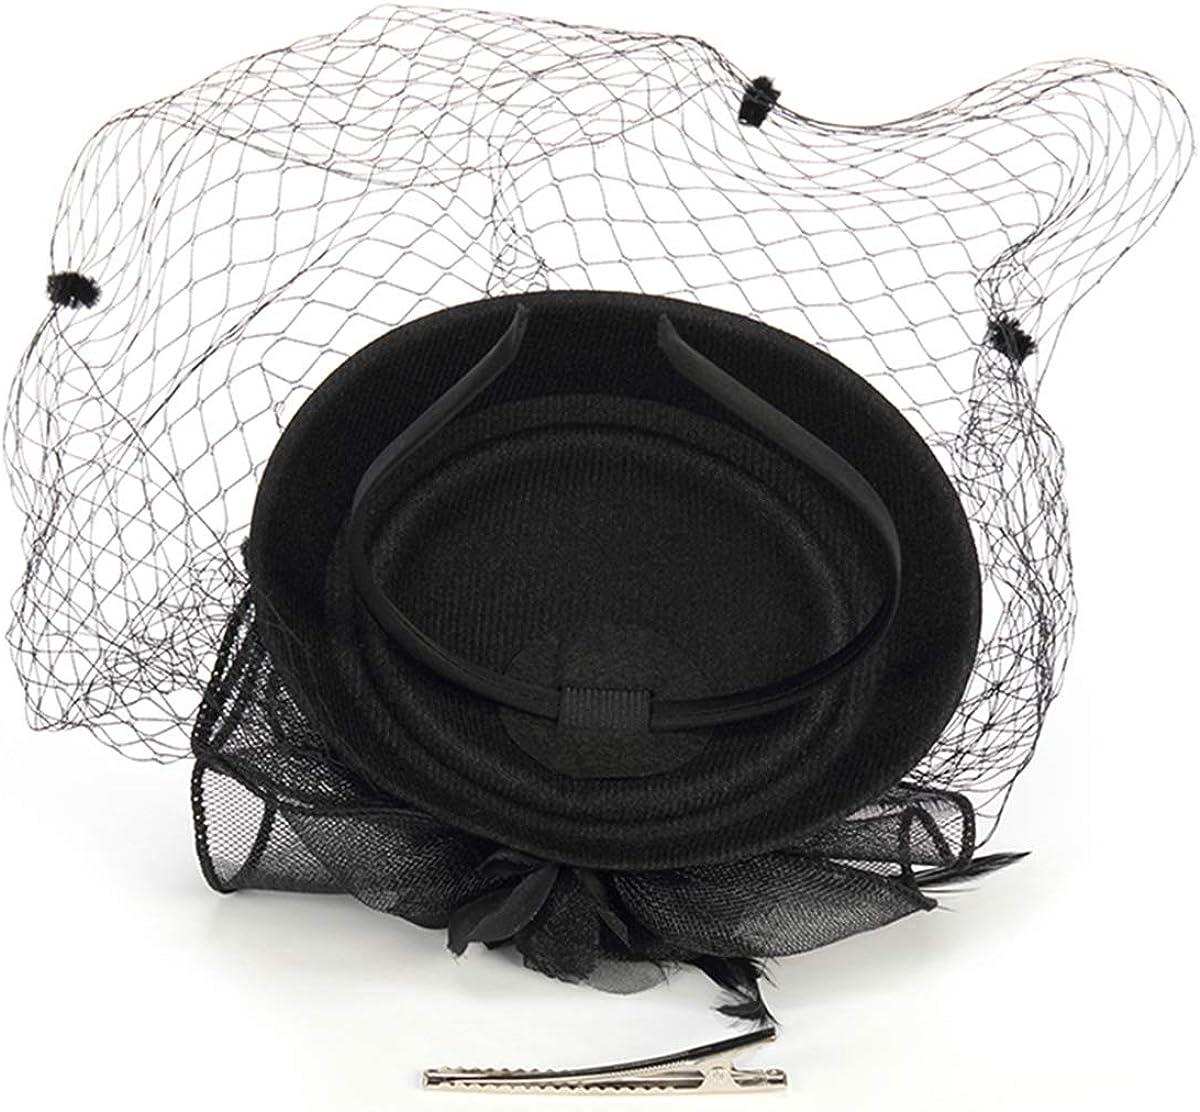 YFWFASH Fascinators for Women Feather Fascinators Pillbox Hat Party Hats for Wedding Derby Tea Easter Church